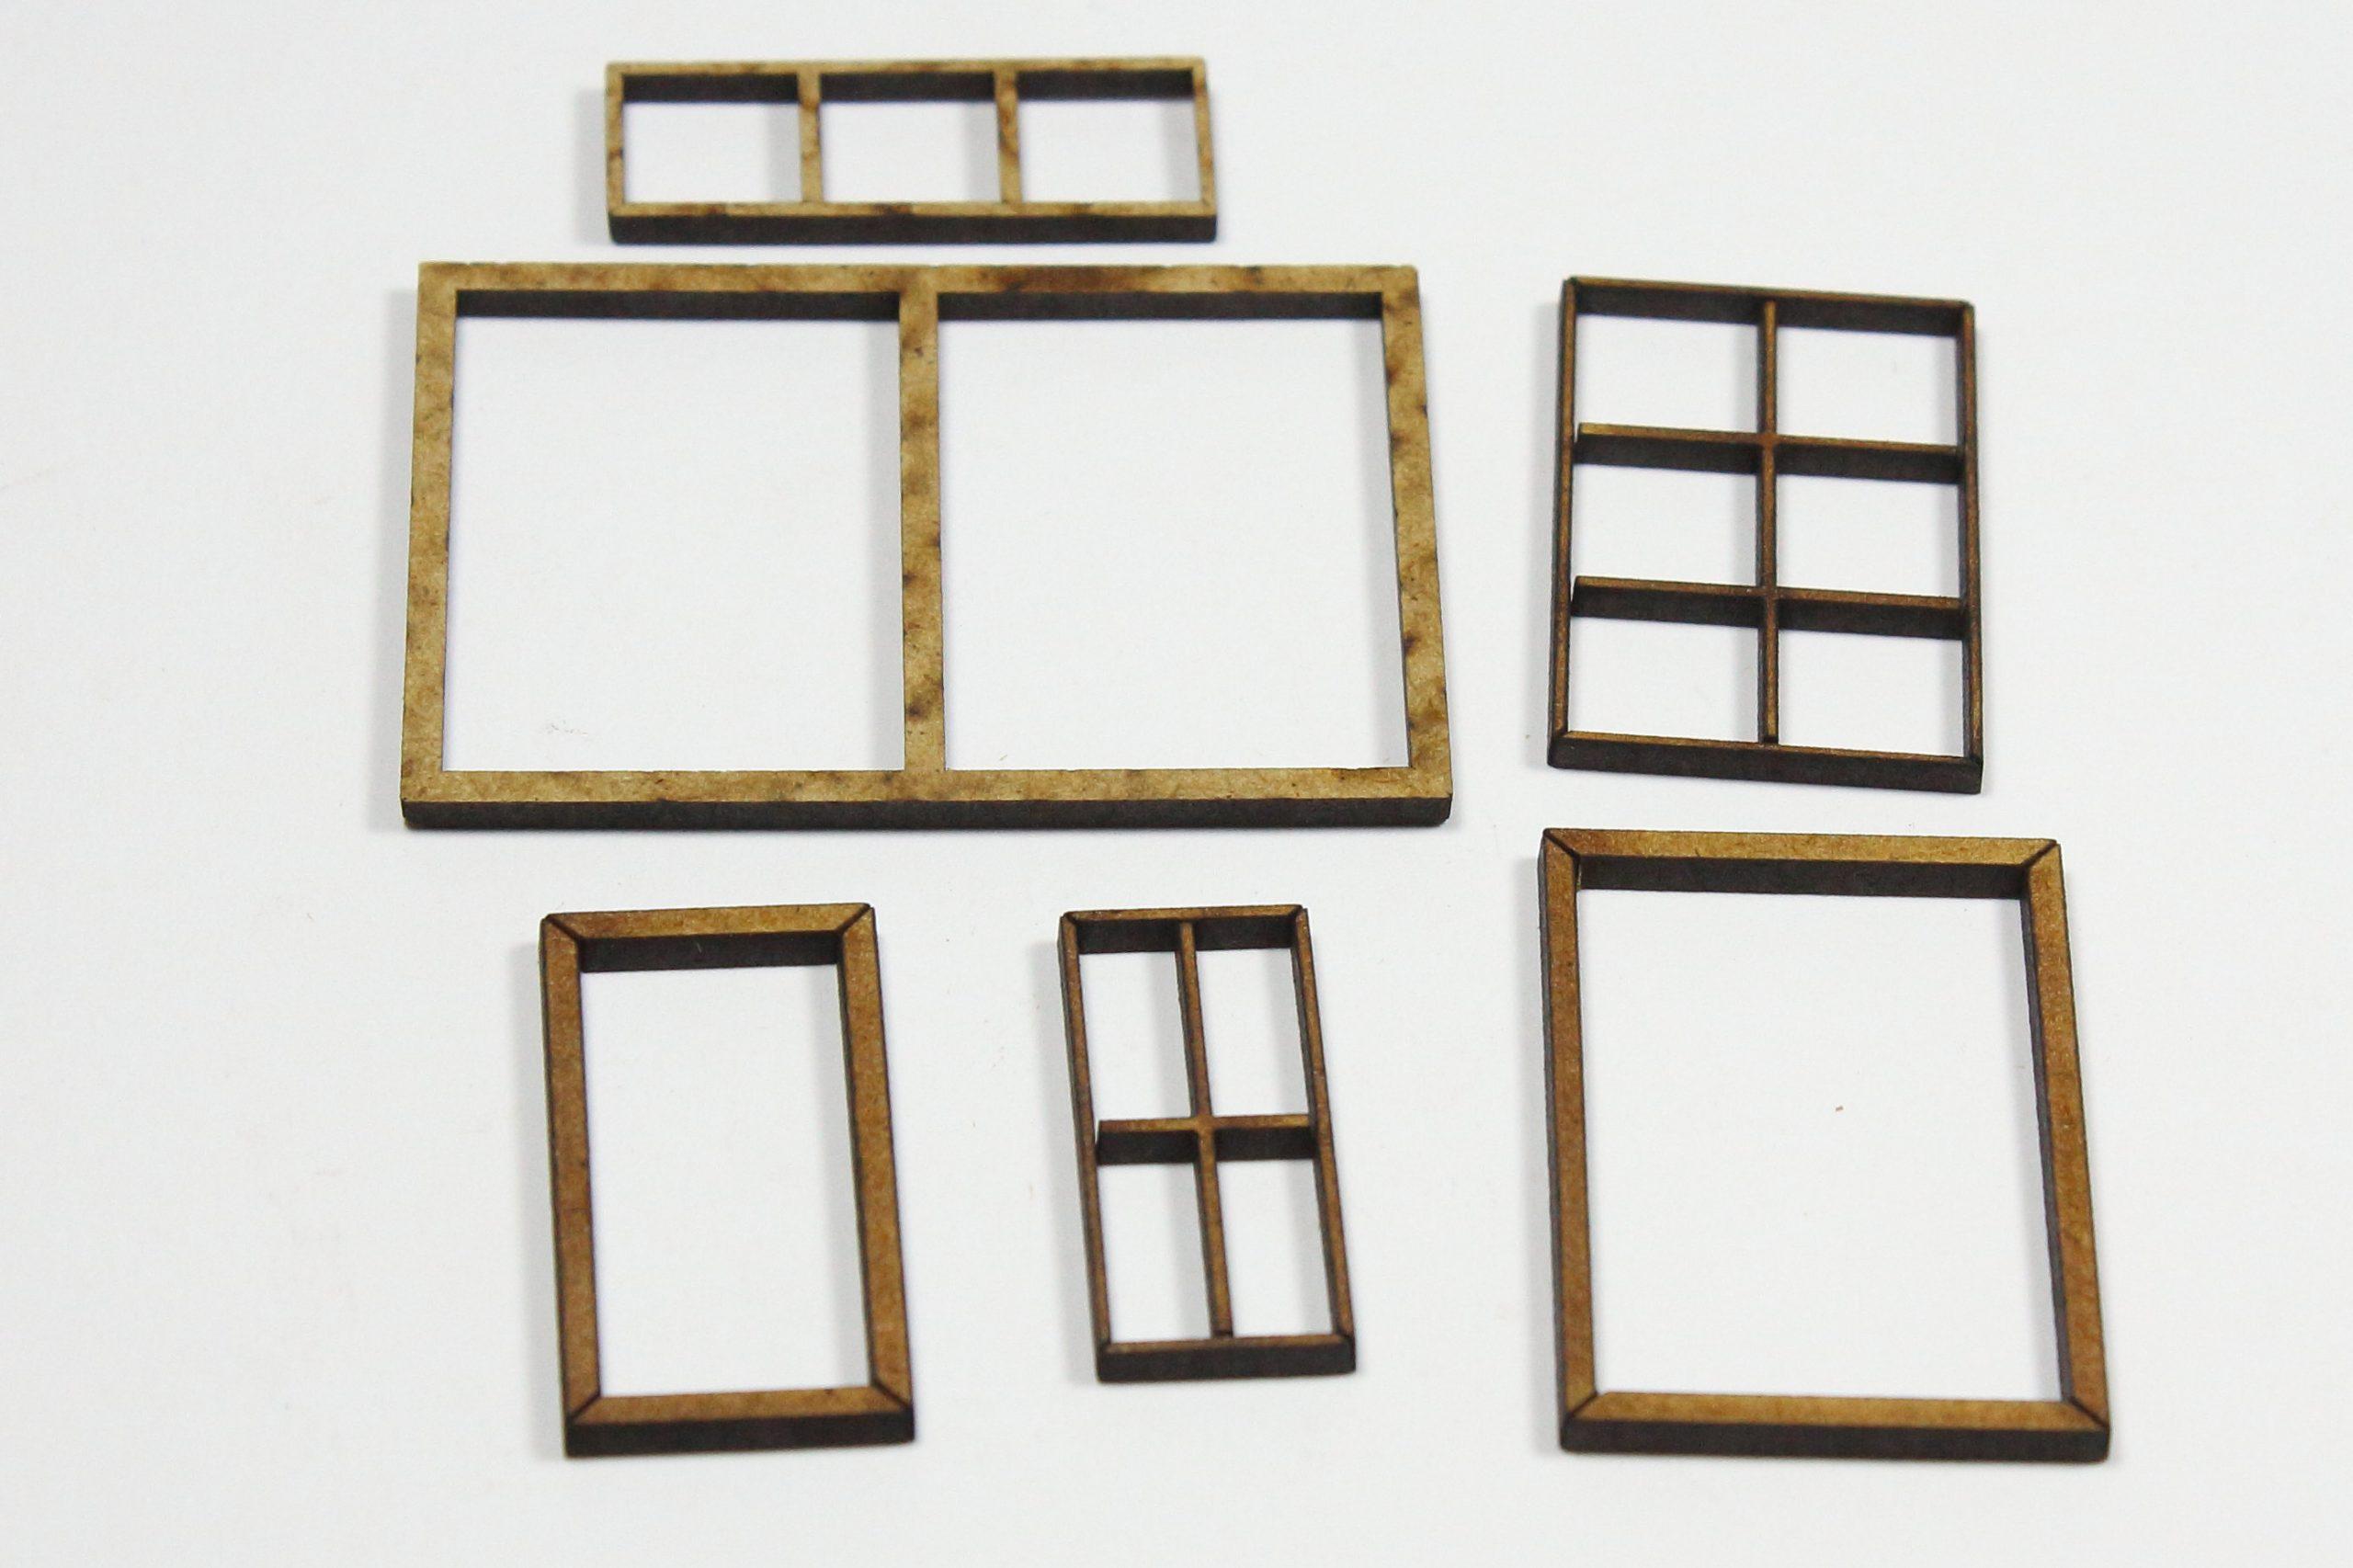 Bild-10-scaled Fachwerkhaus mit Holzschuppen - Lasercut Modellbaushop 1:35